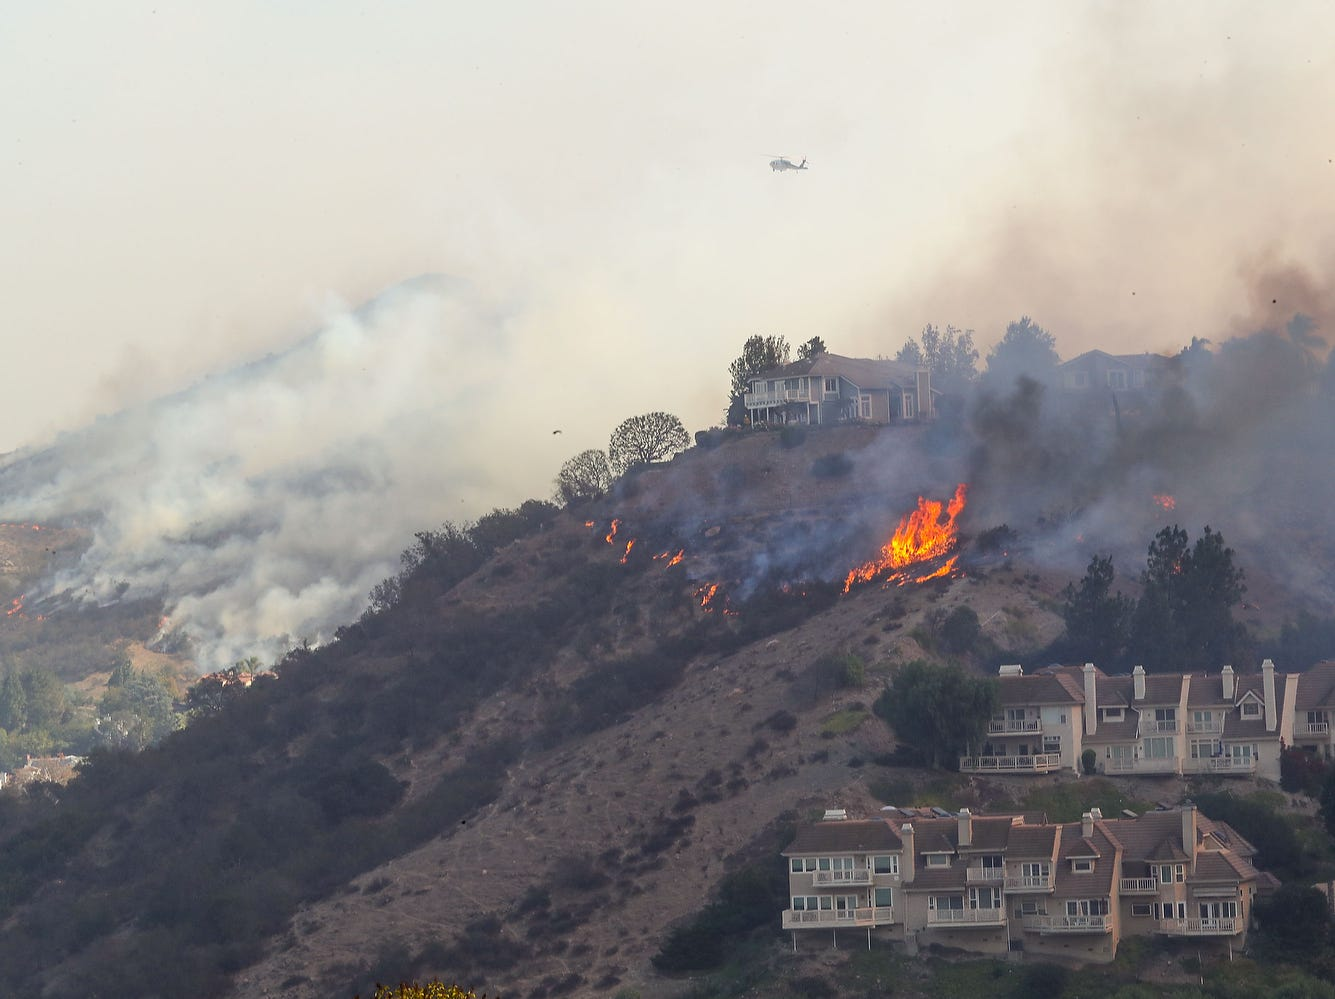 The Woolsey Fire threatens hillside homes in Westlake Village, Calif.